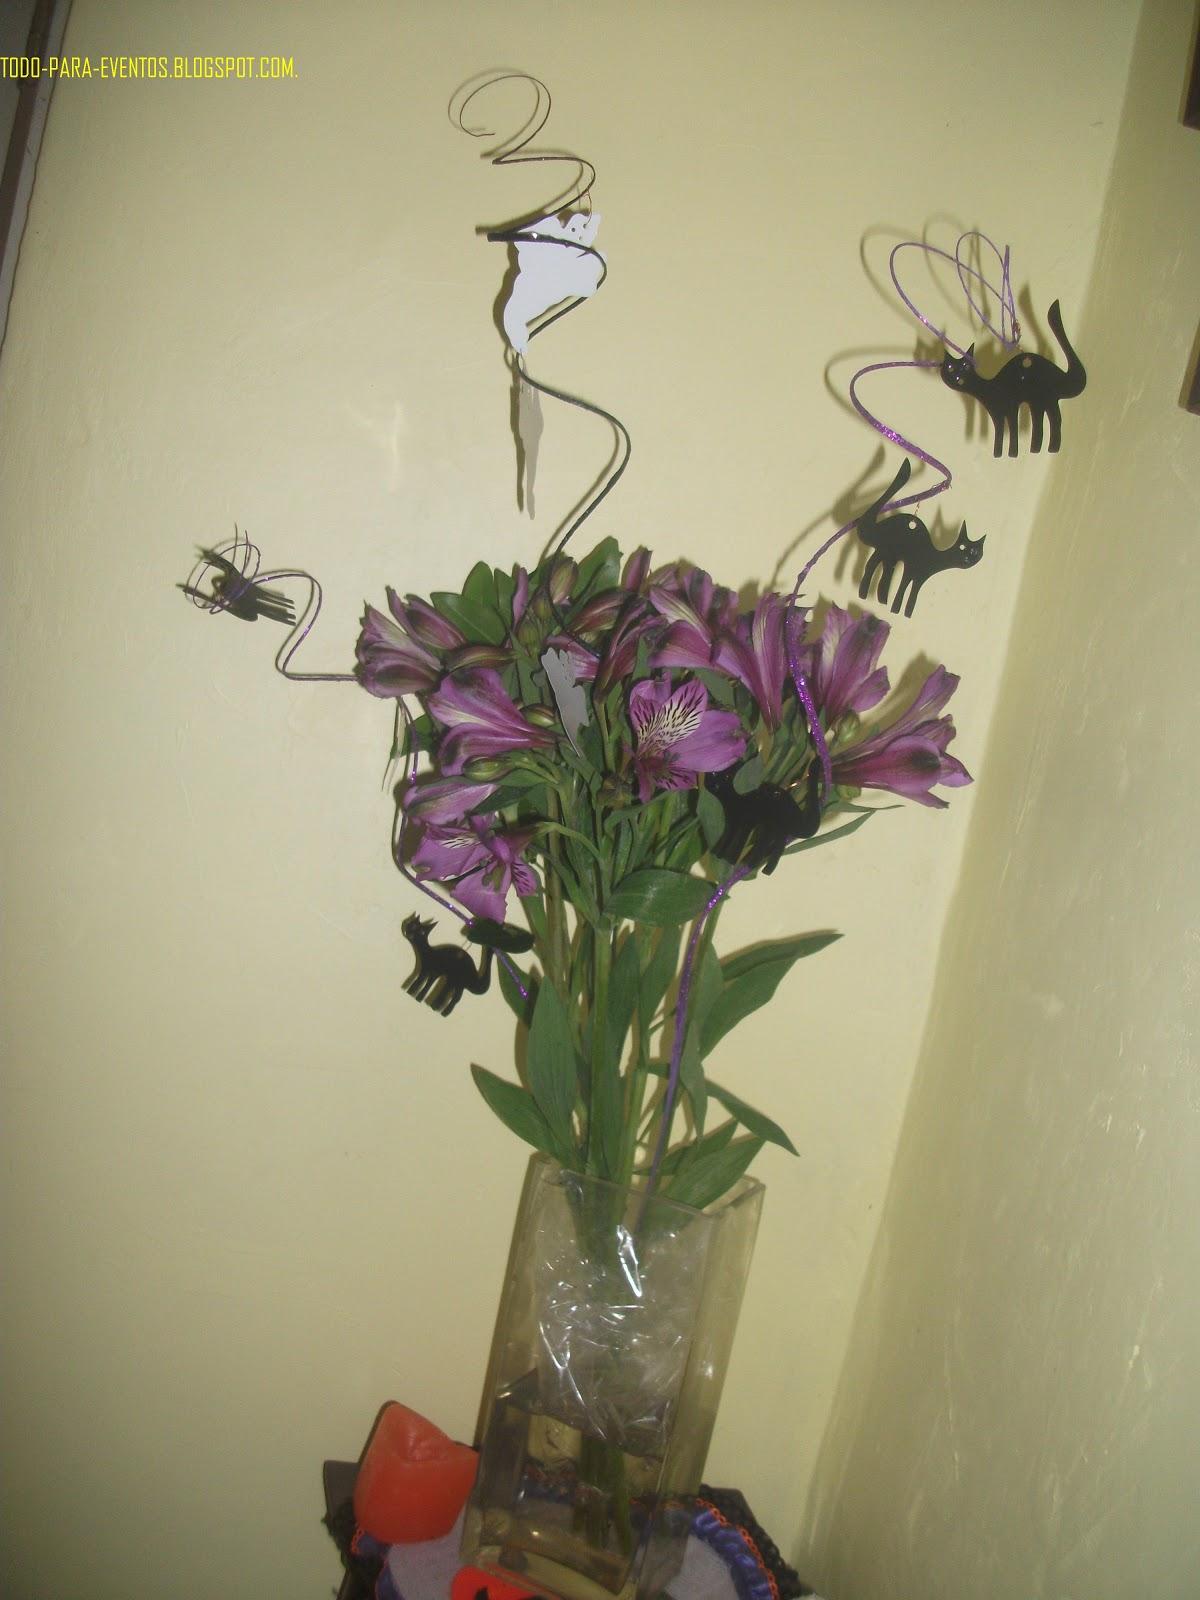 Pin ramo de flores tulipanes florero grandes pelautscom on - Ramos de flores grandes ...